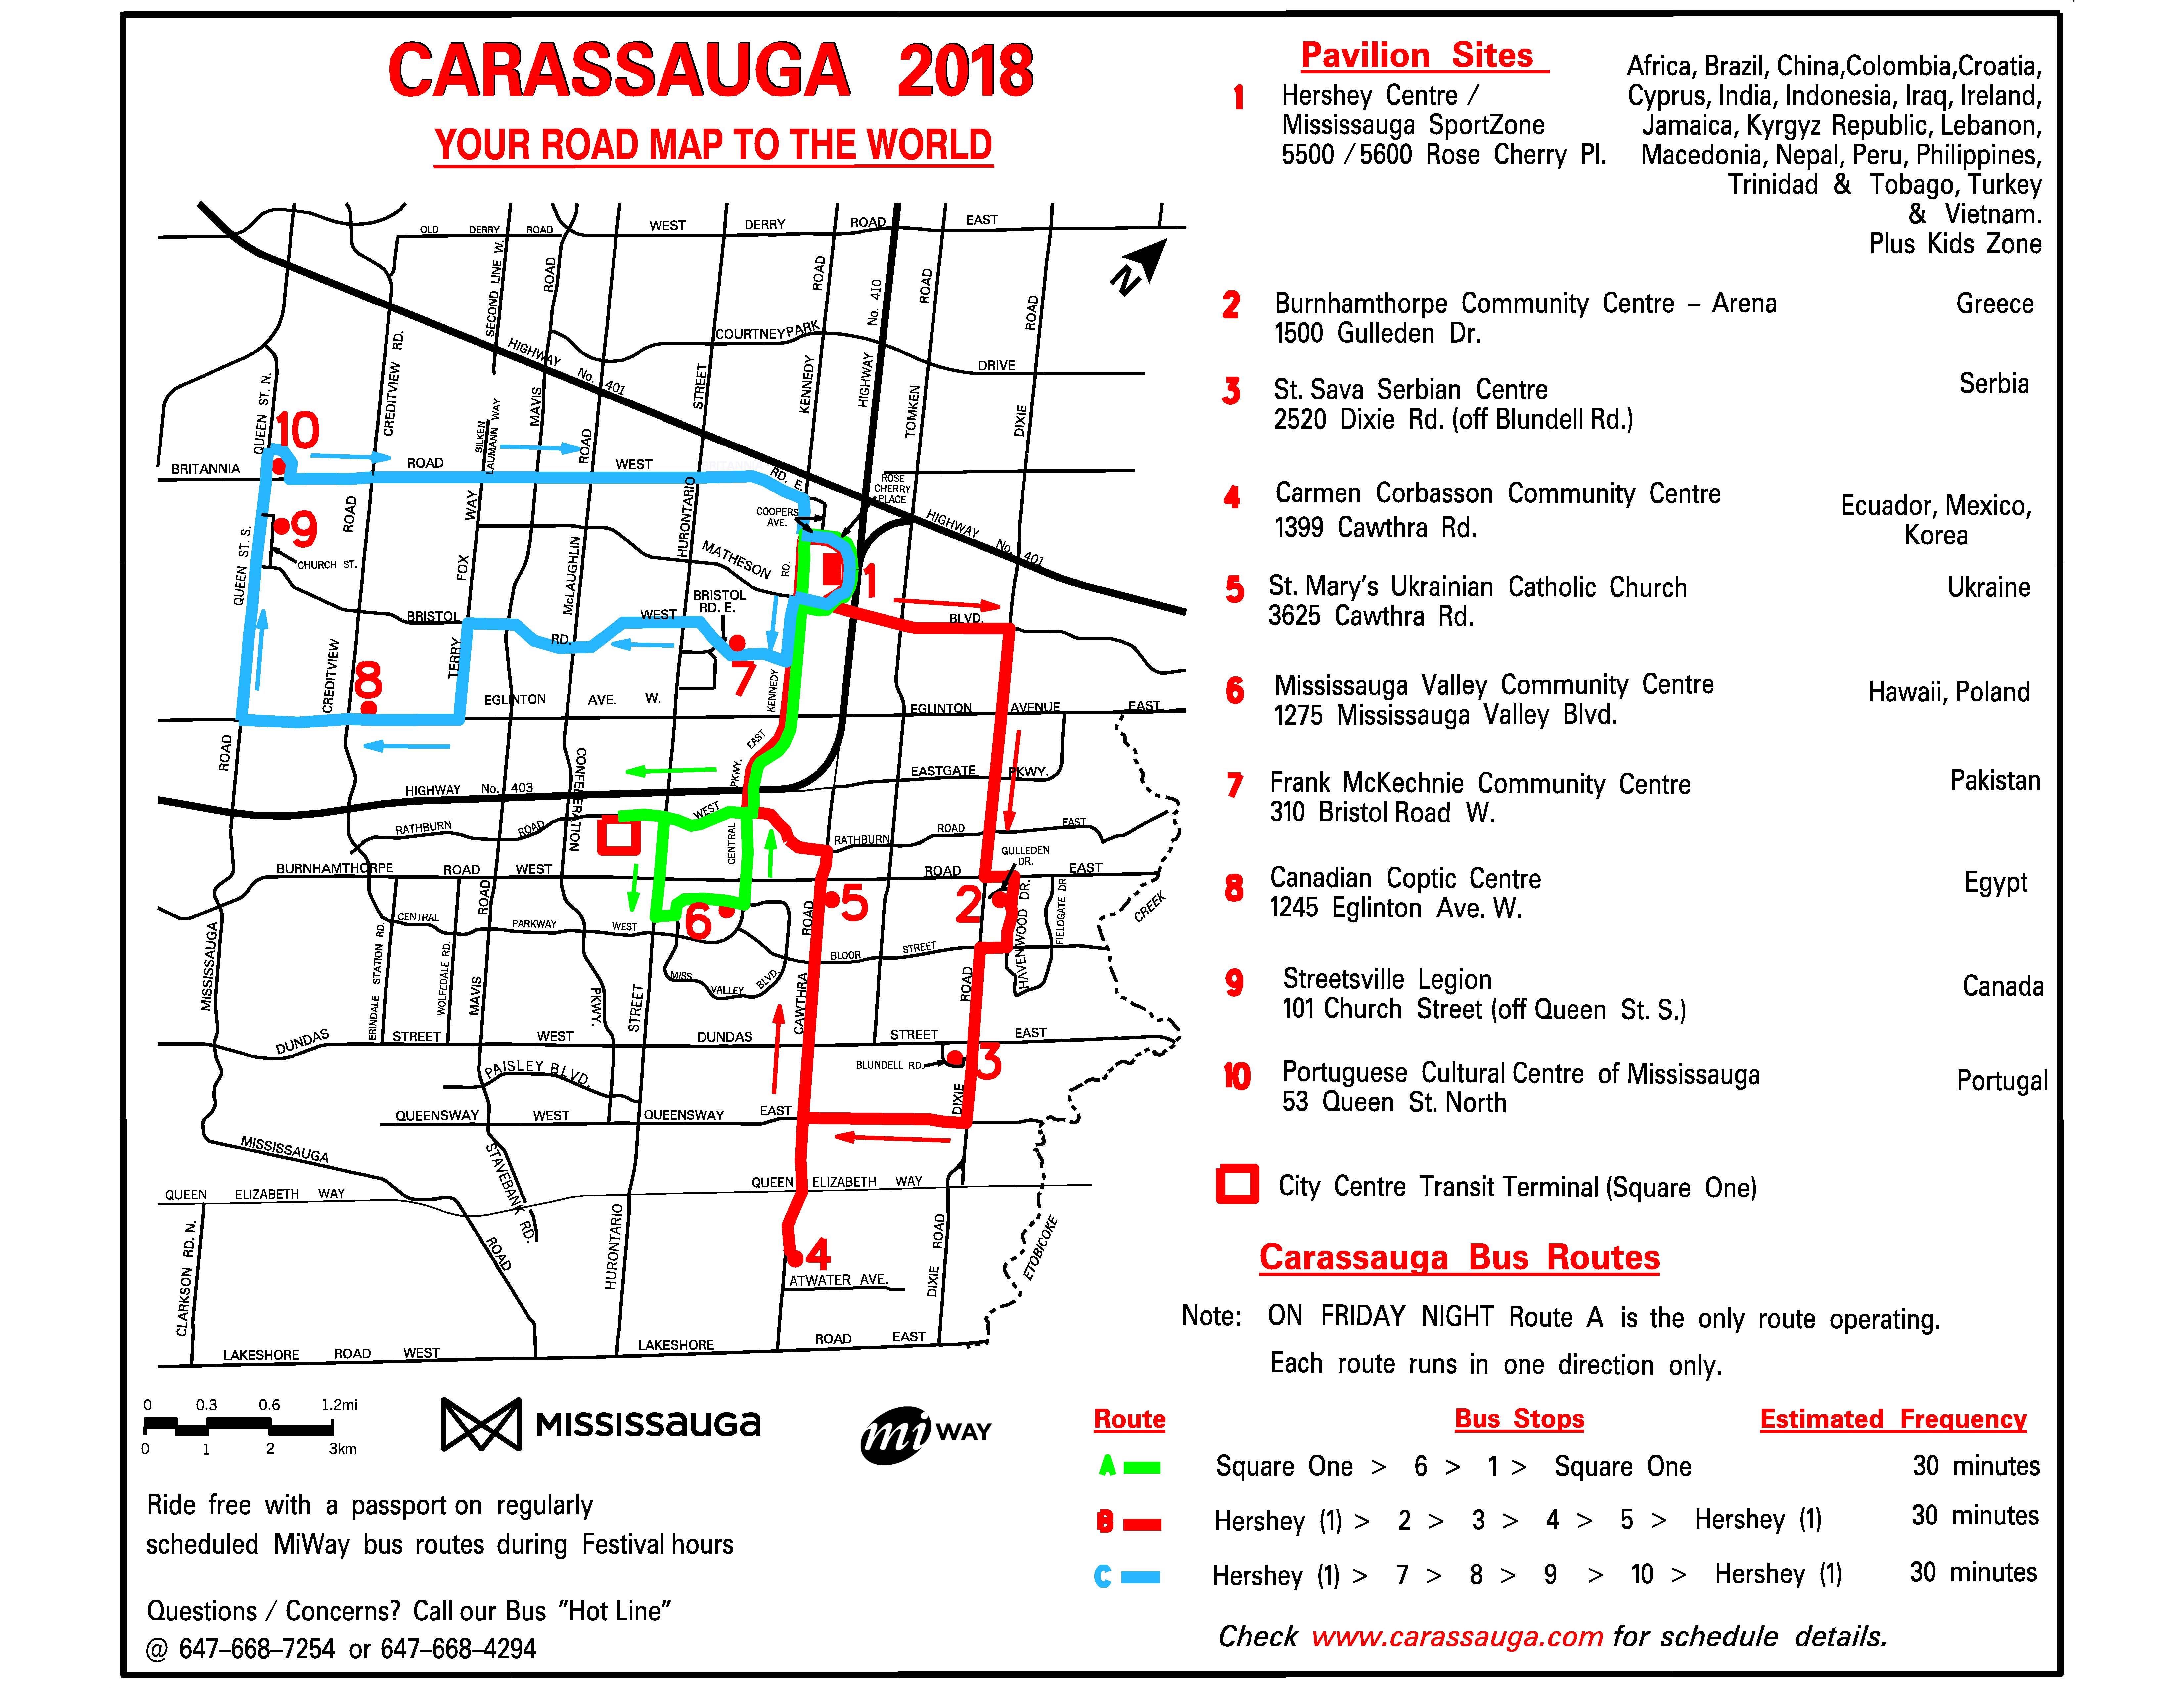 carassauga buses | carassauga festival